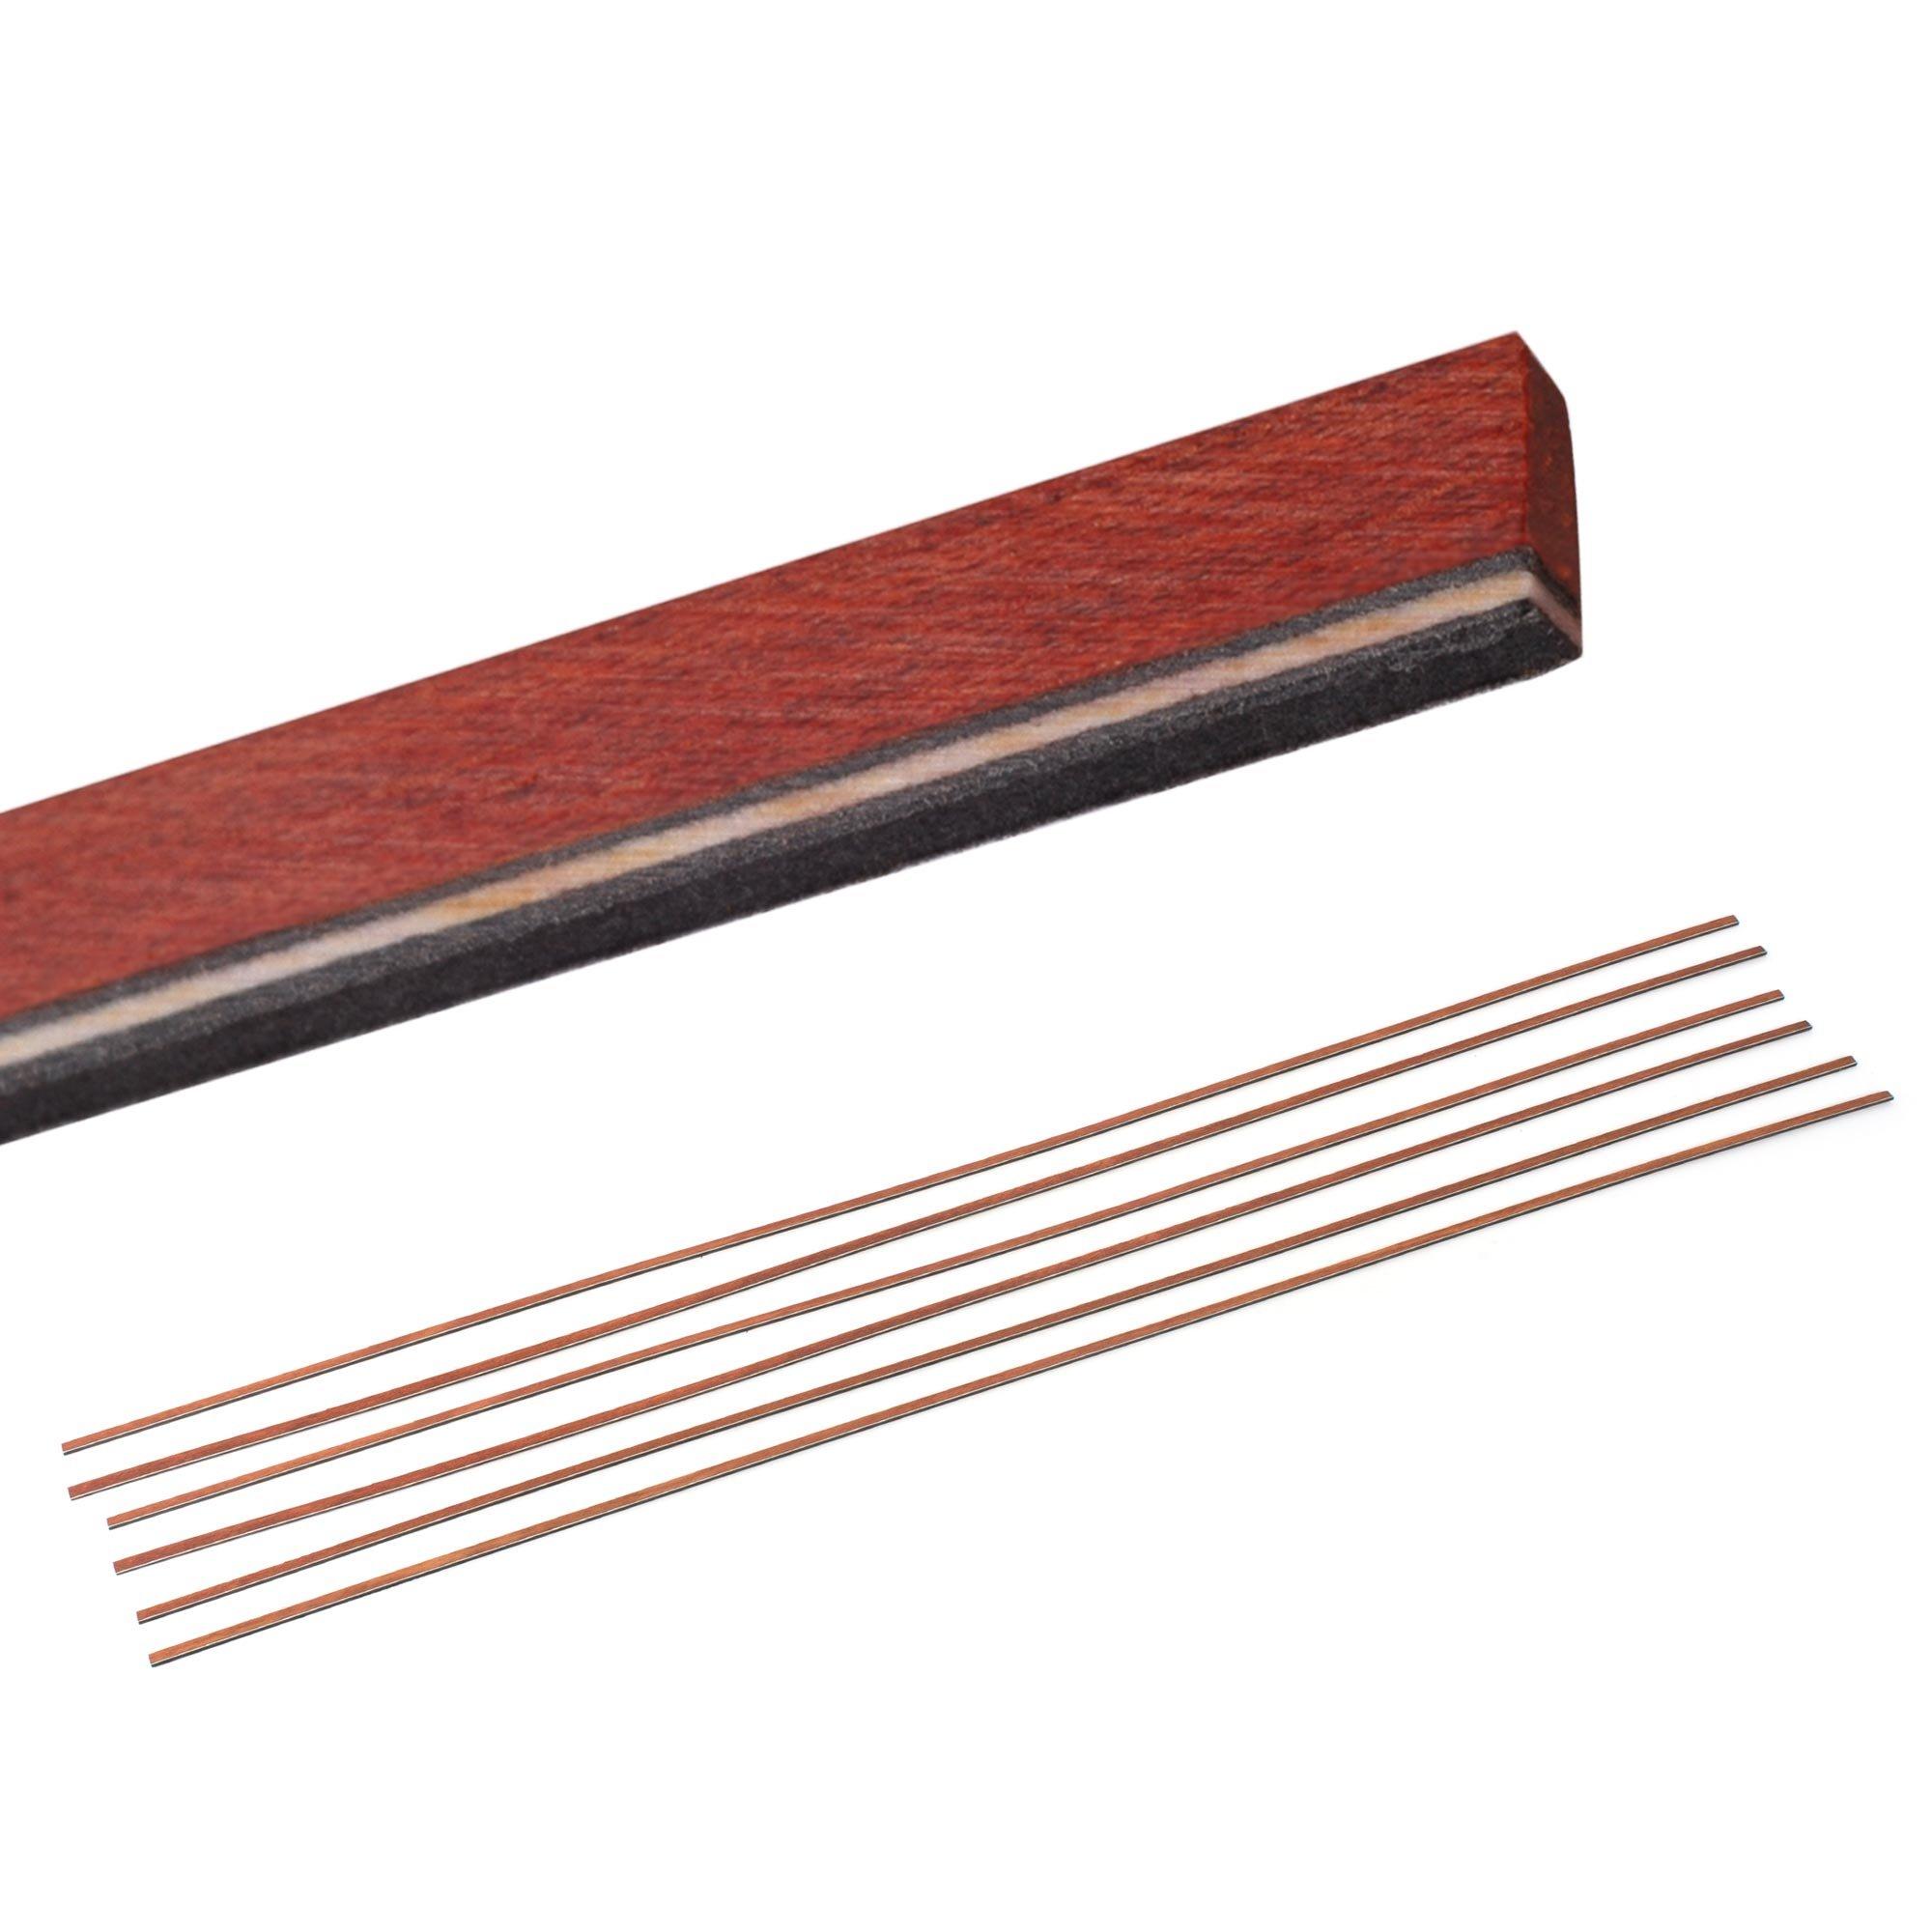 StewMac Natural Wood Guitar Bindings, Bloodwood with b/w/b Trim - 6 Pack